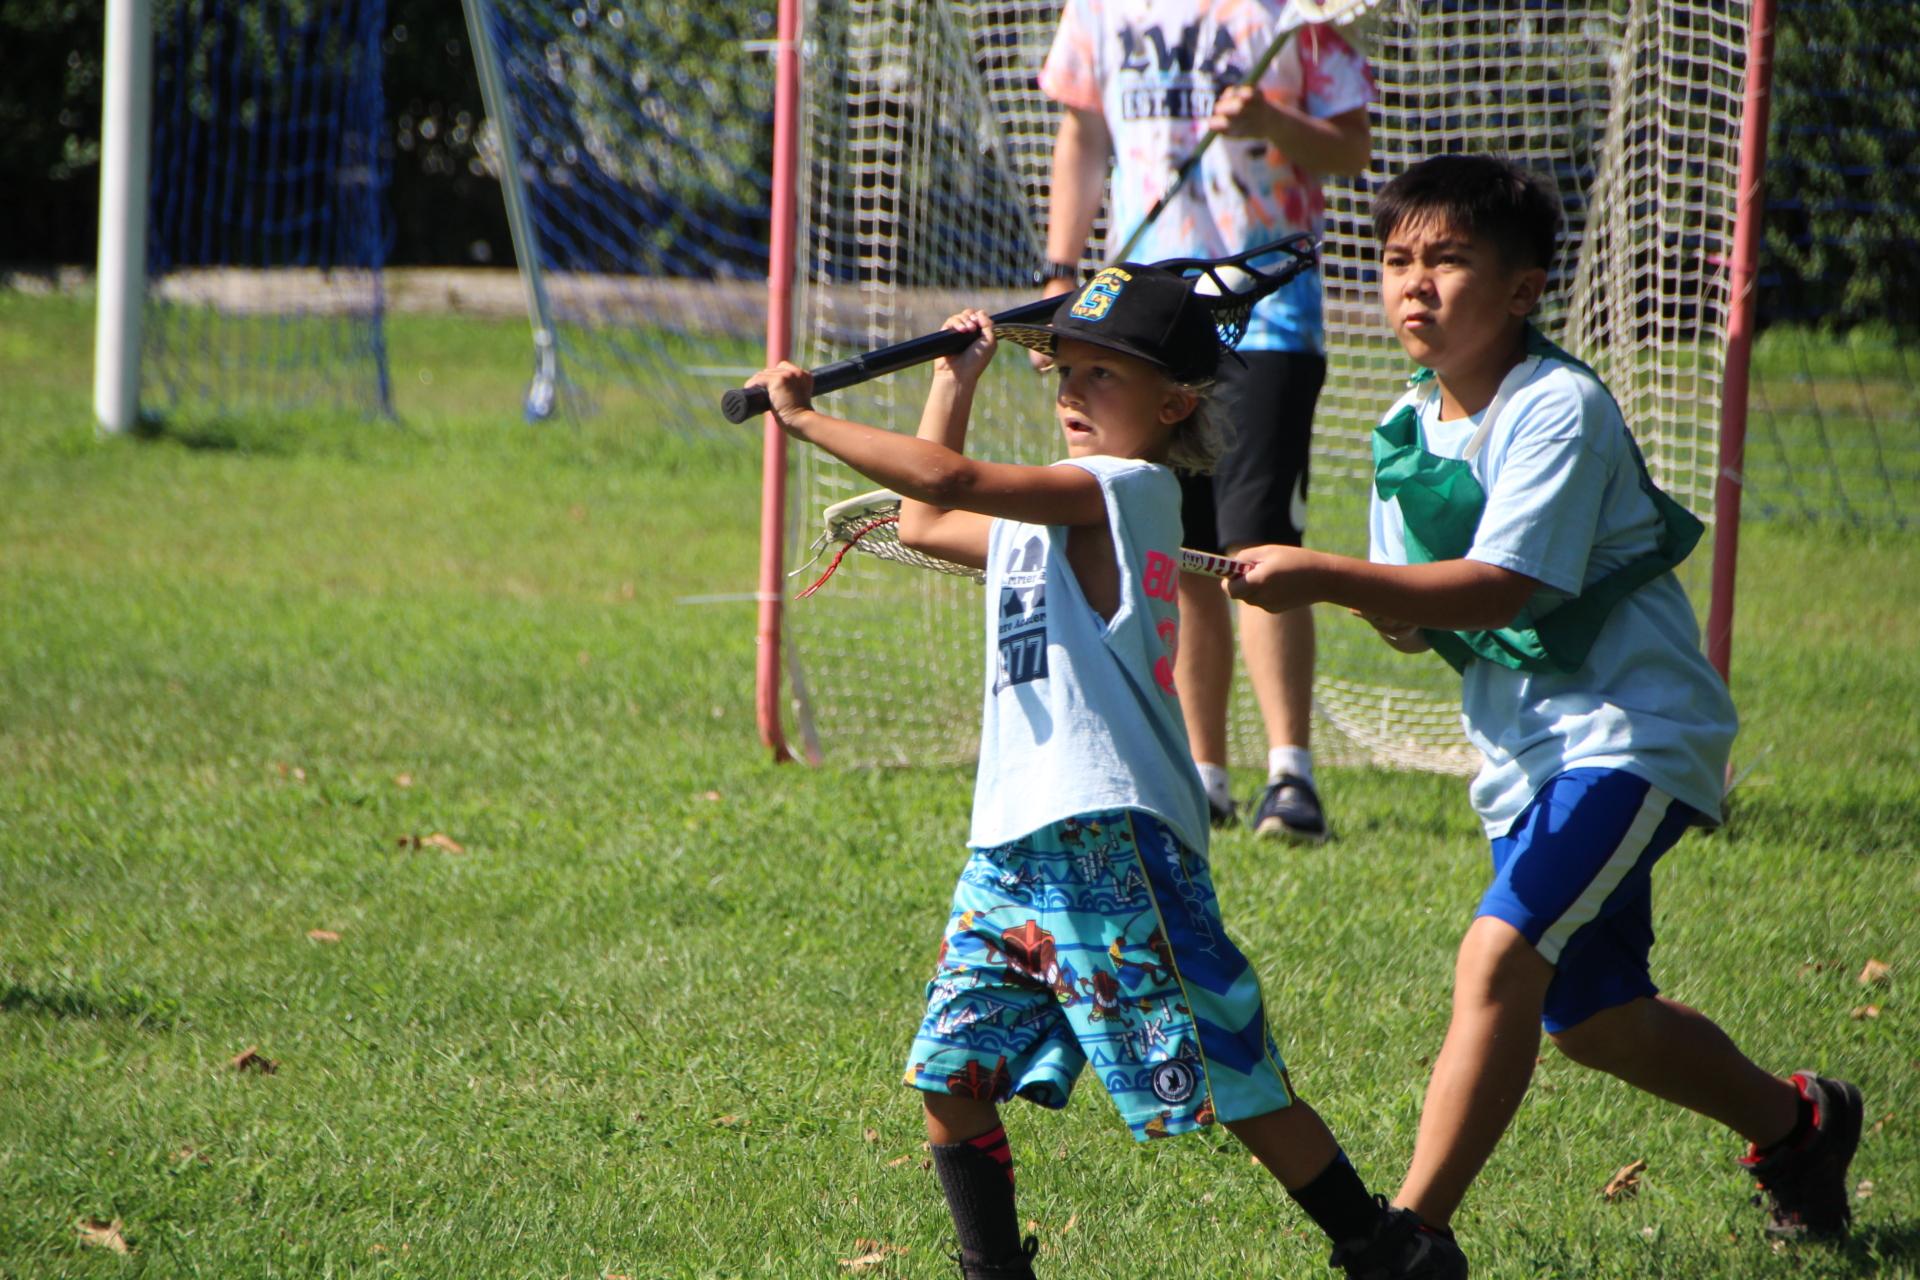 8 9 CSA Lacrosse Clinic